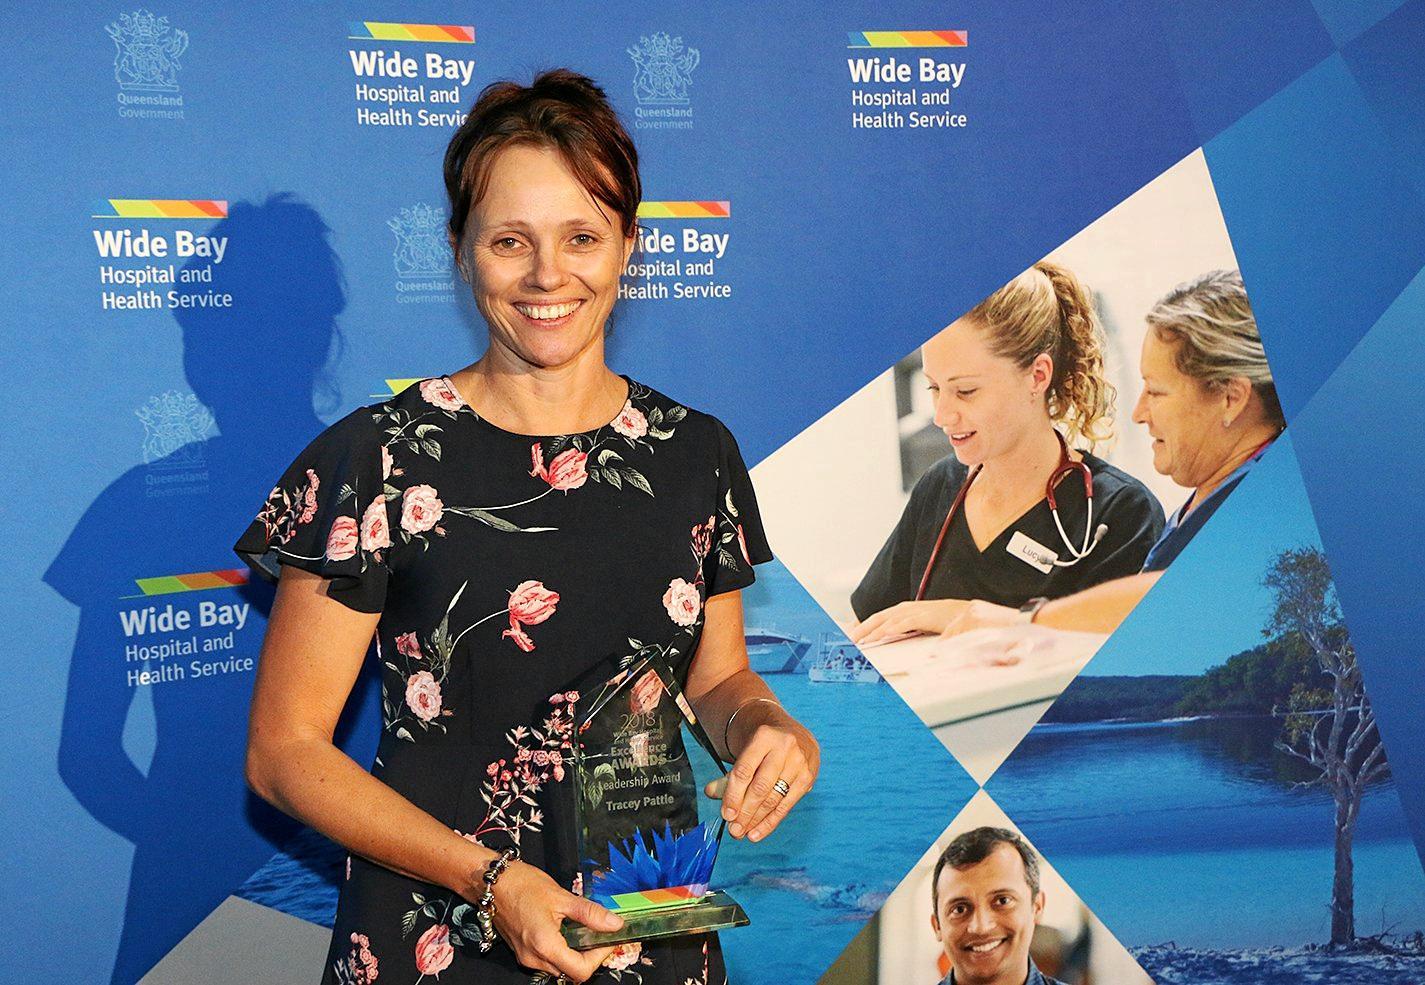 Winner of the WBHHS Leadership Award Monto MPHJS Director of Nursing Tracey Pattie.